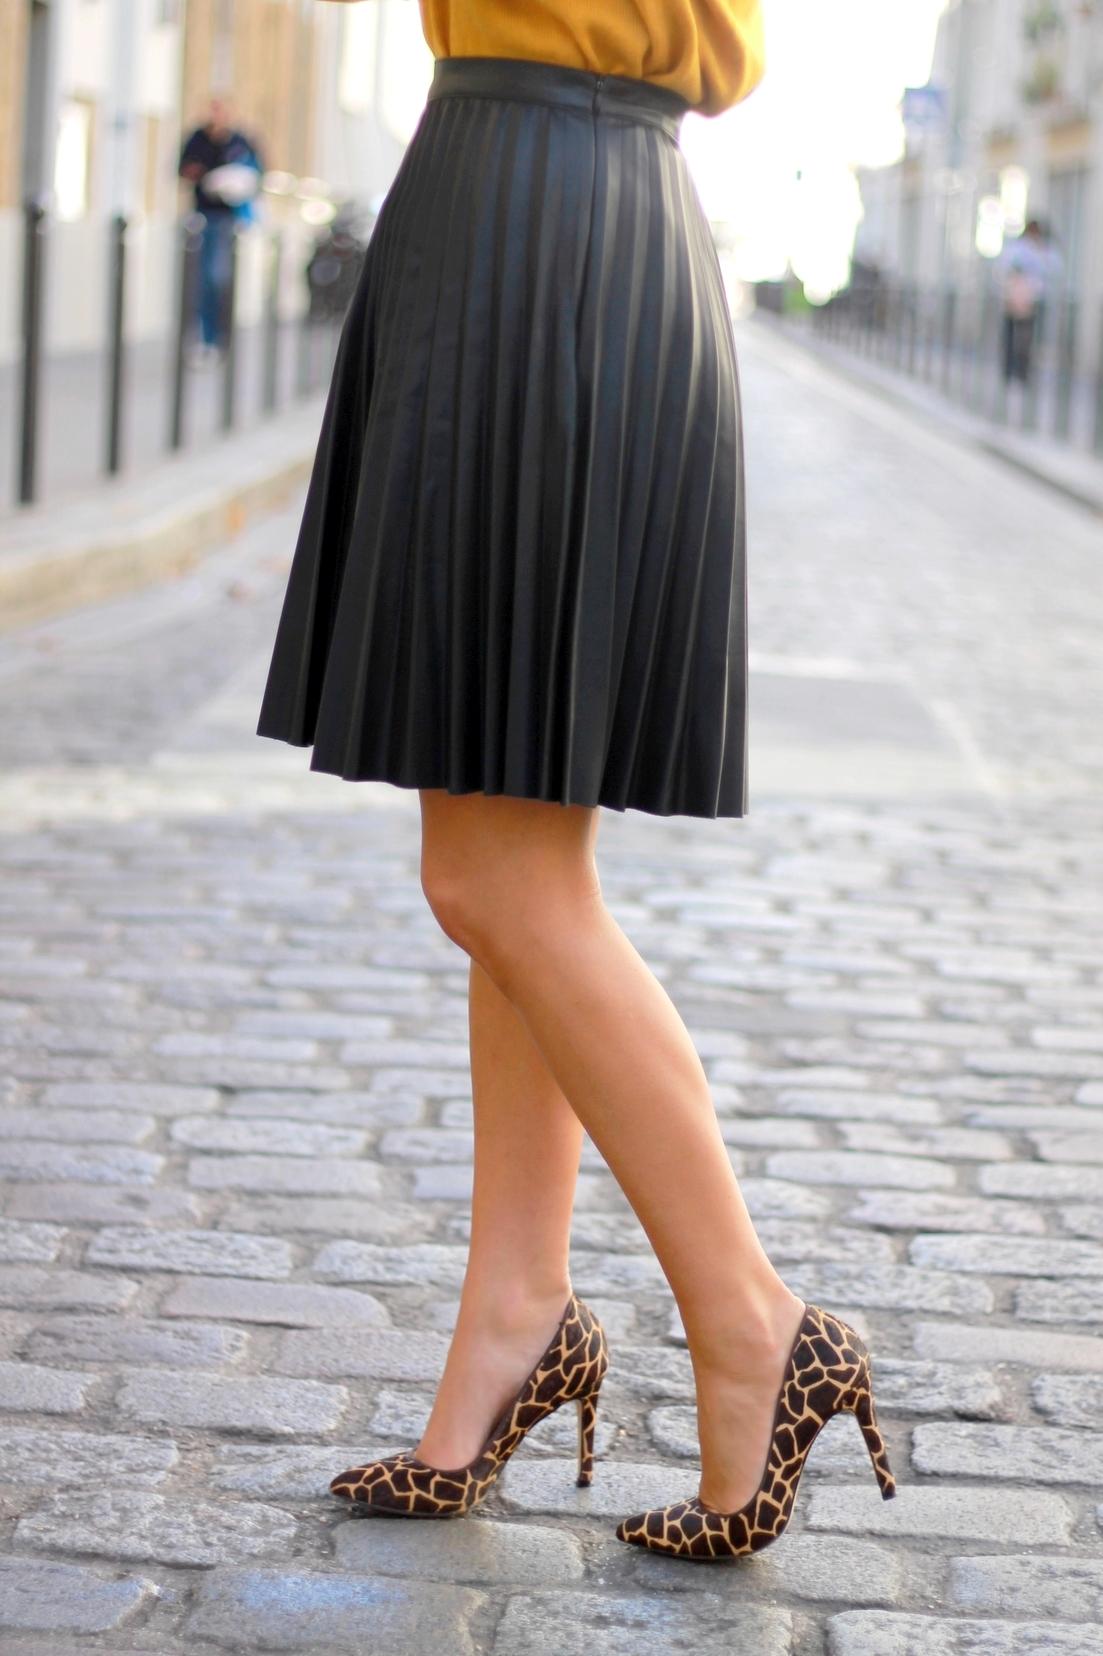 jupe midi plissée zara en simili cuir noir escarpins imprimé animal girafe bata